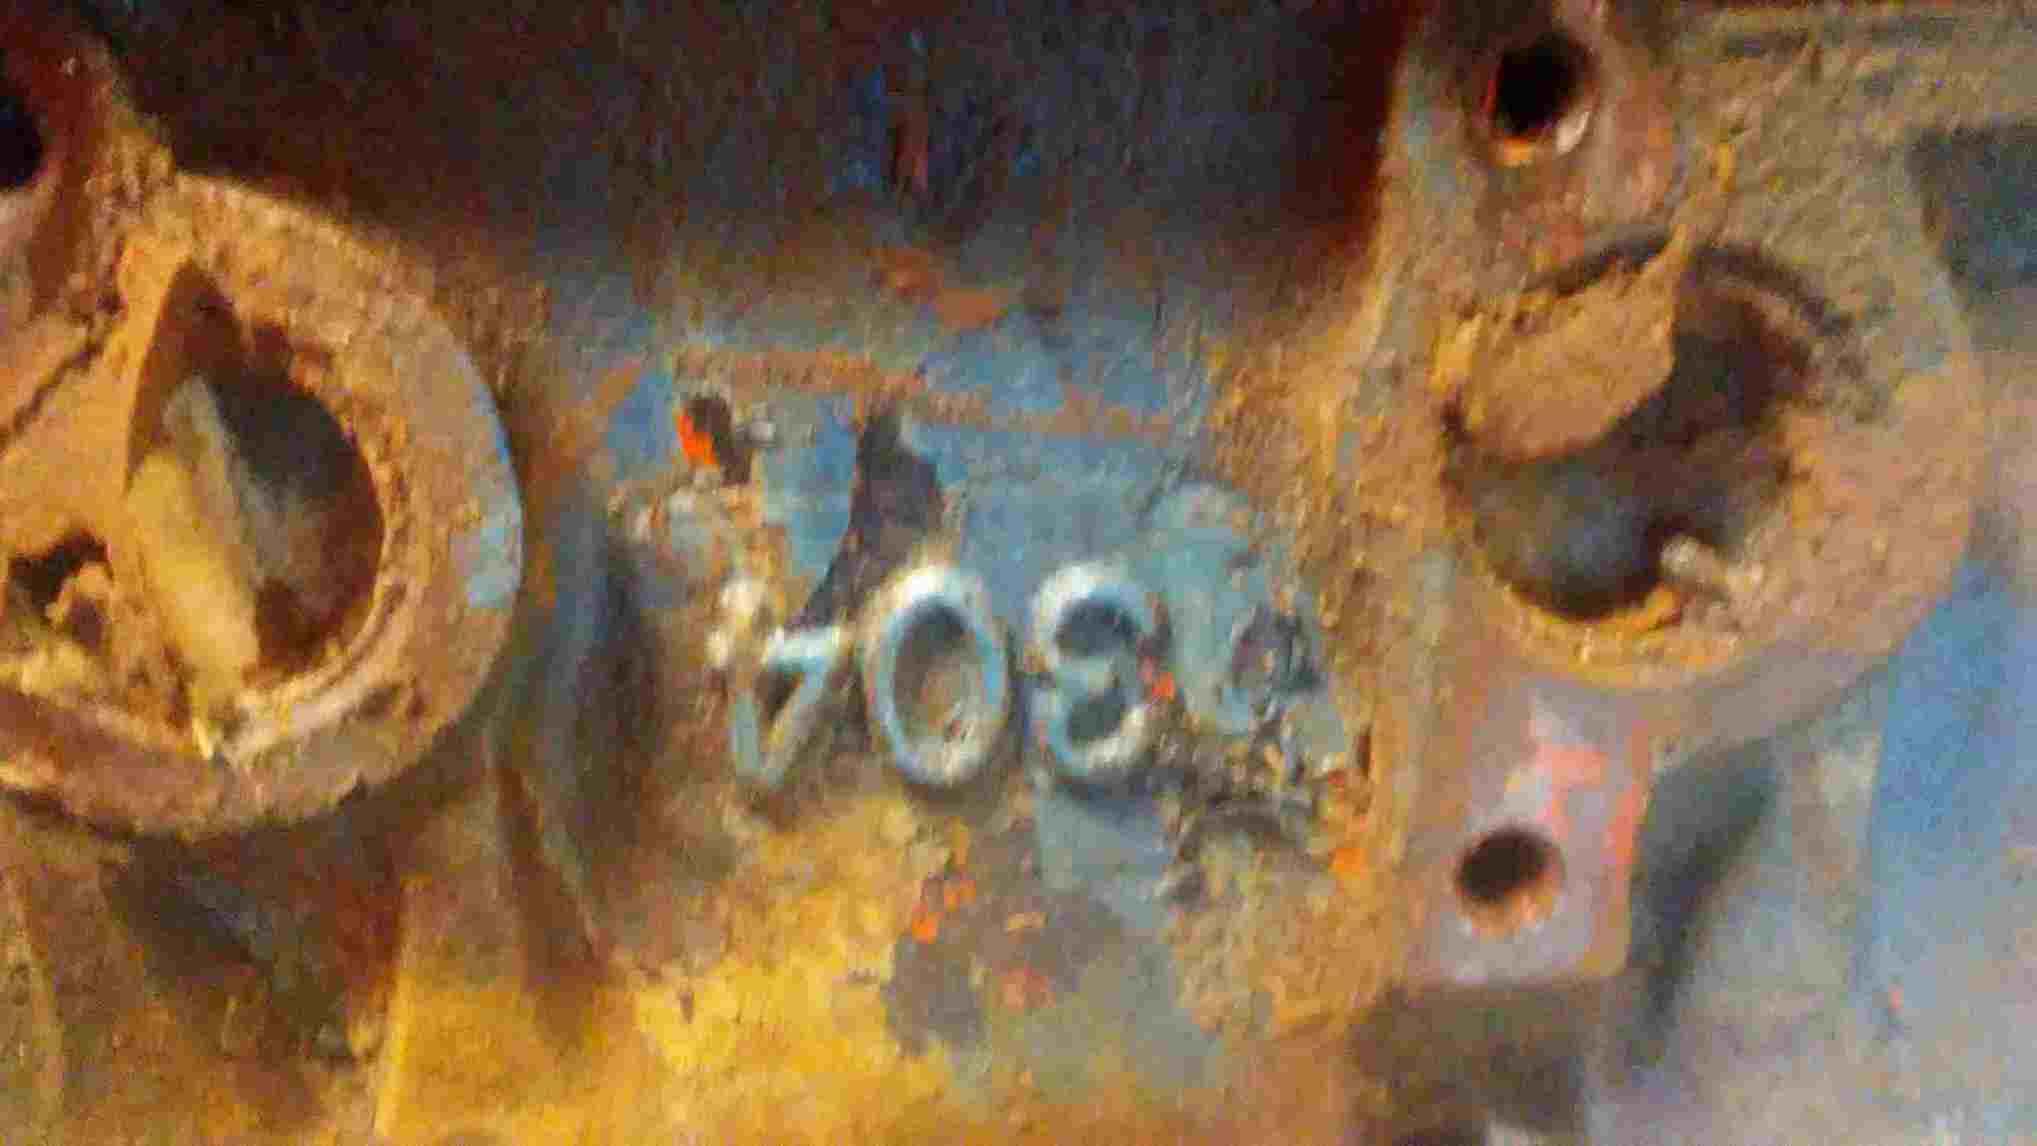 IMG_1670(1).JPG